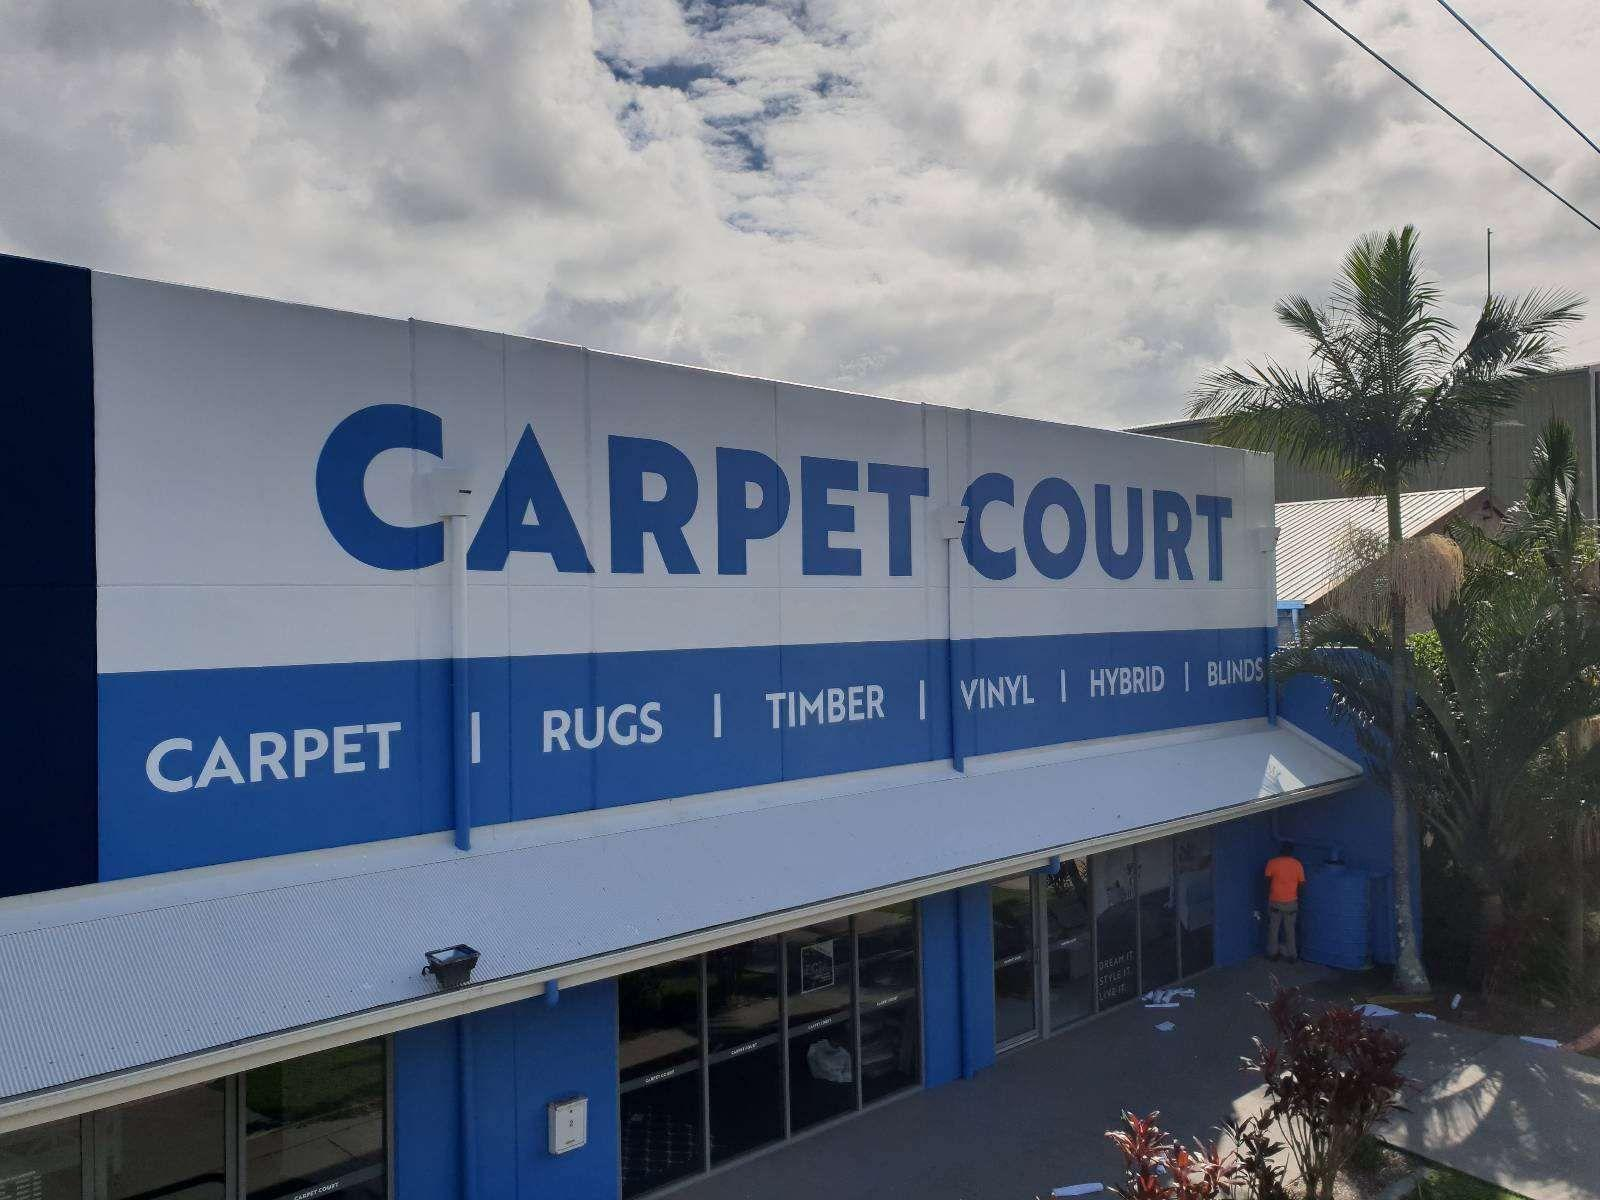 Coulters Carpet Court